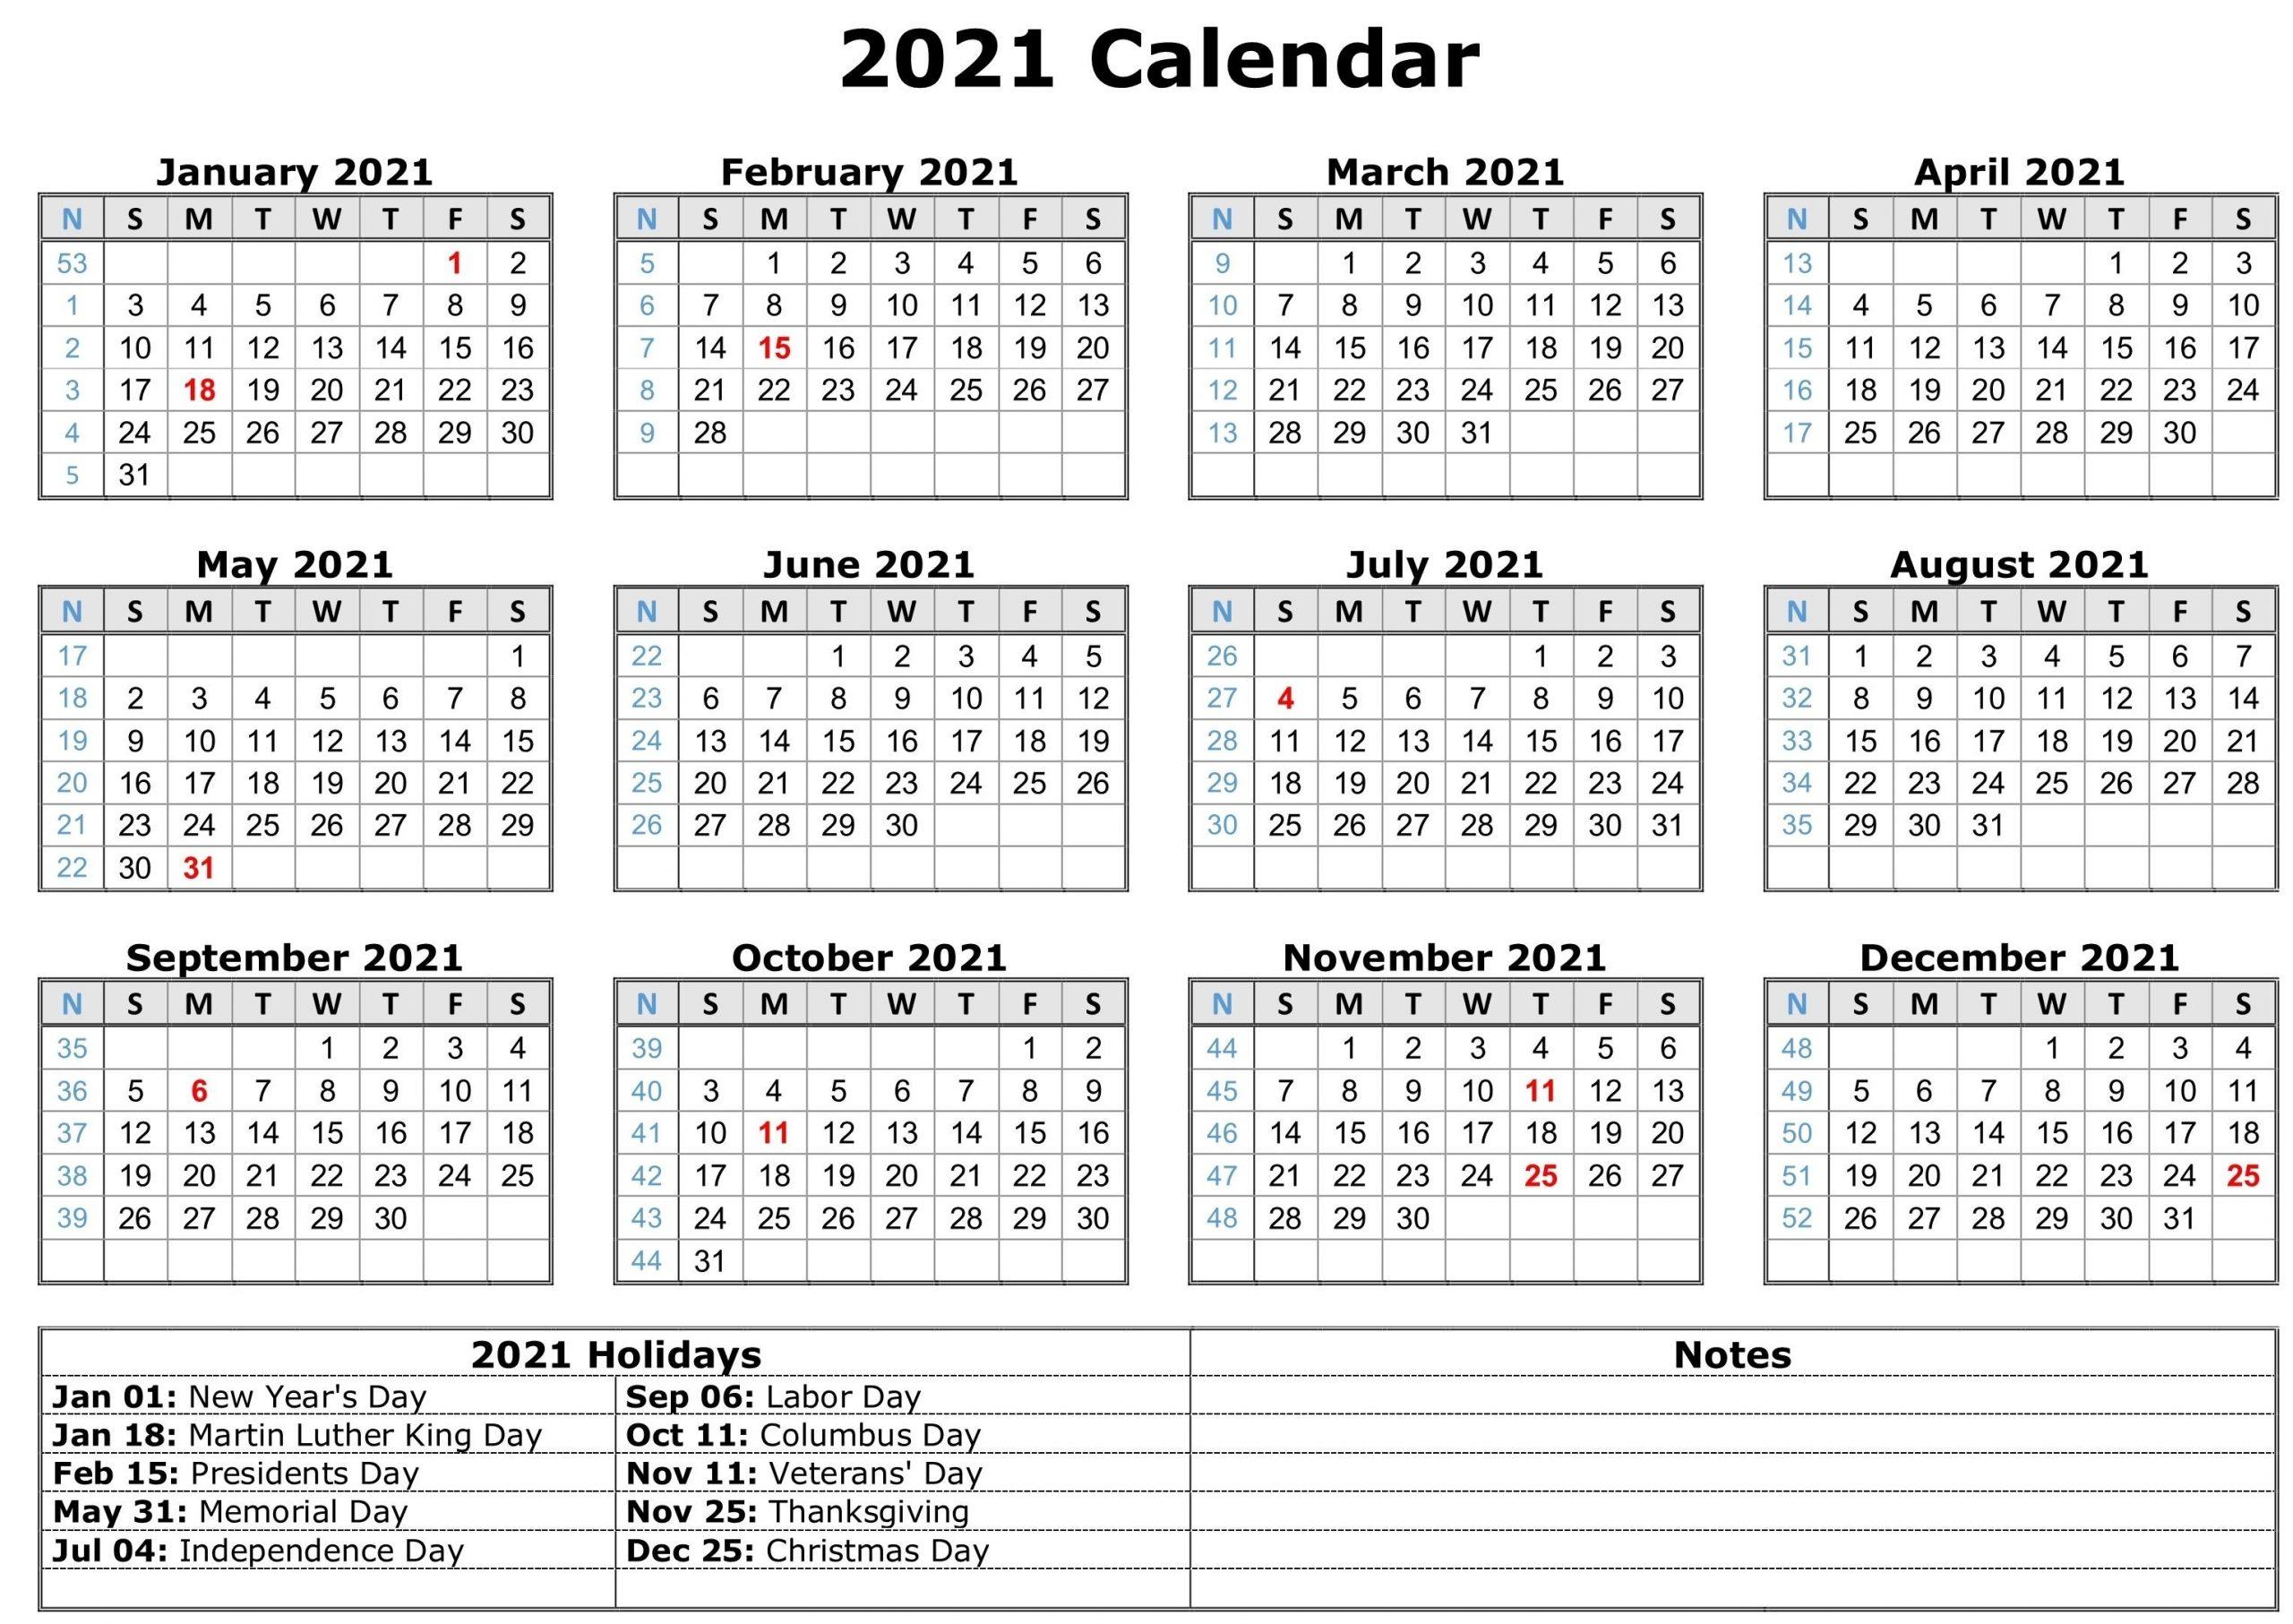 2021 Calendar With Holidays | Free Calendar Template  Free Printable 2021 Calendar